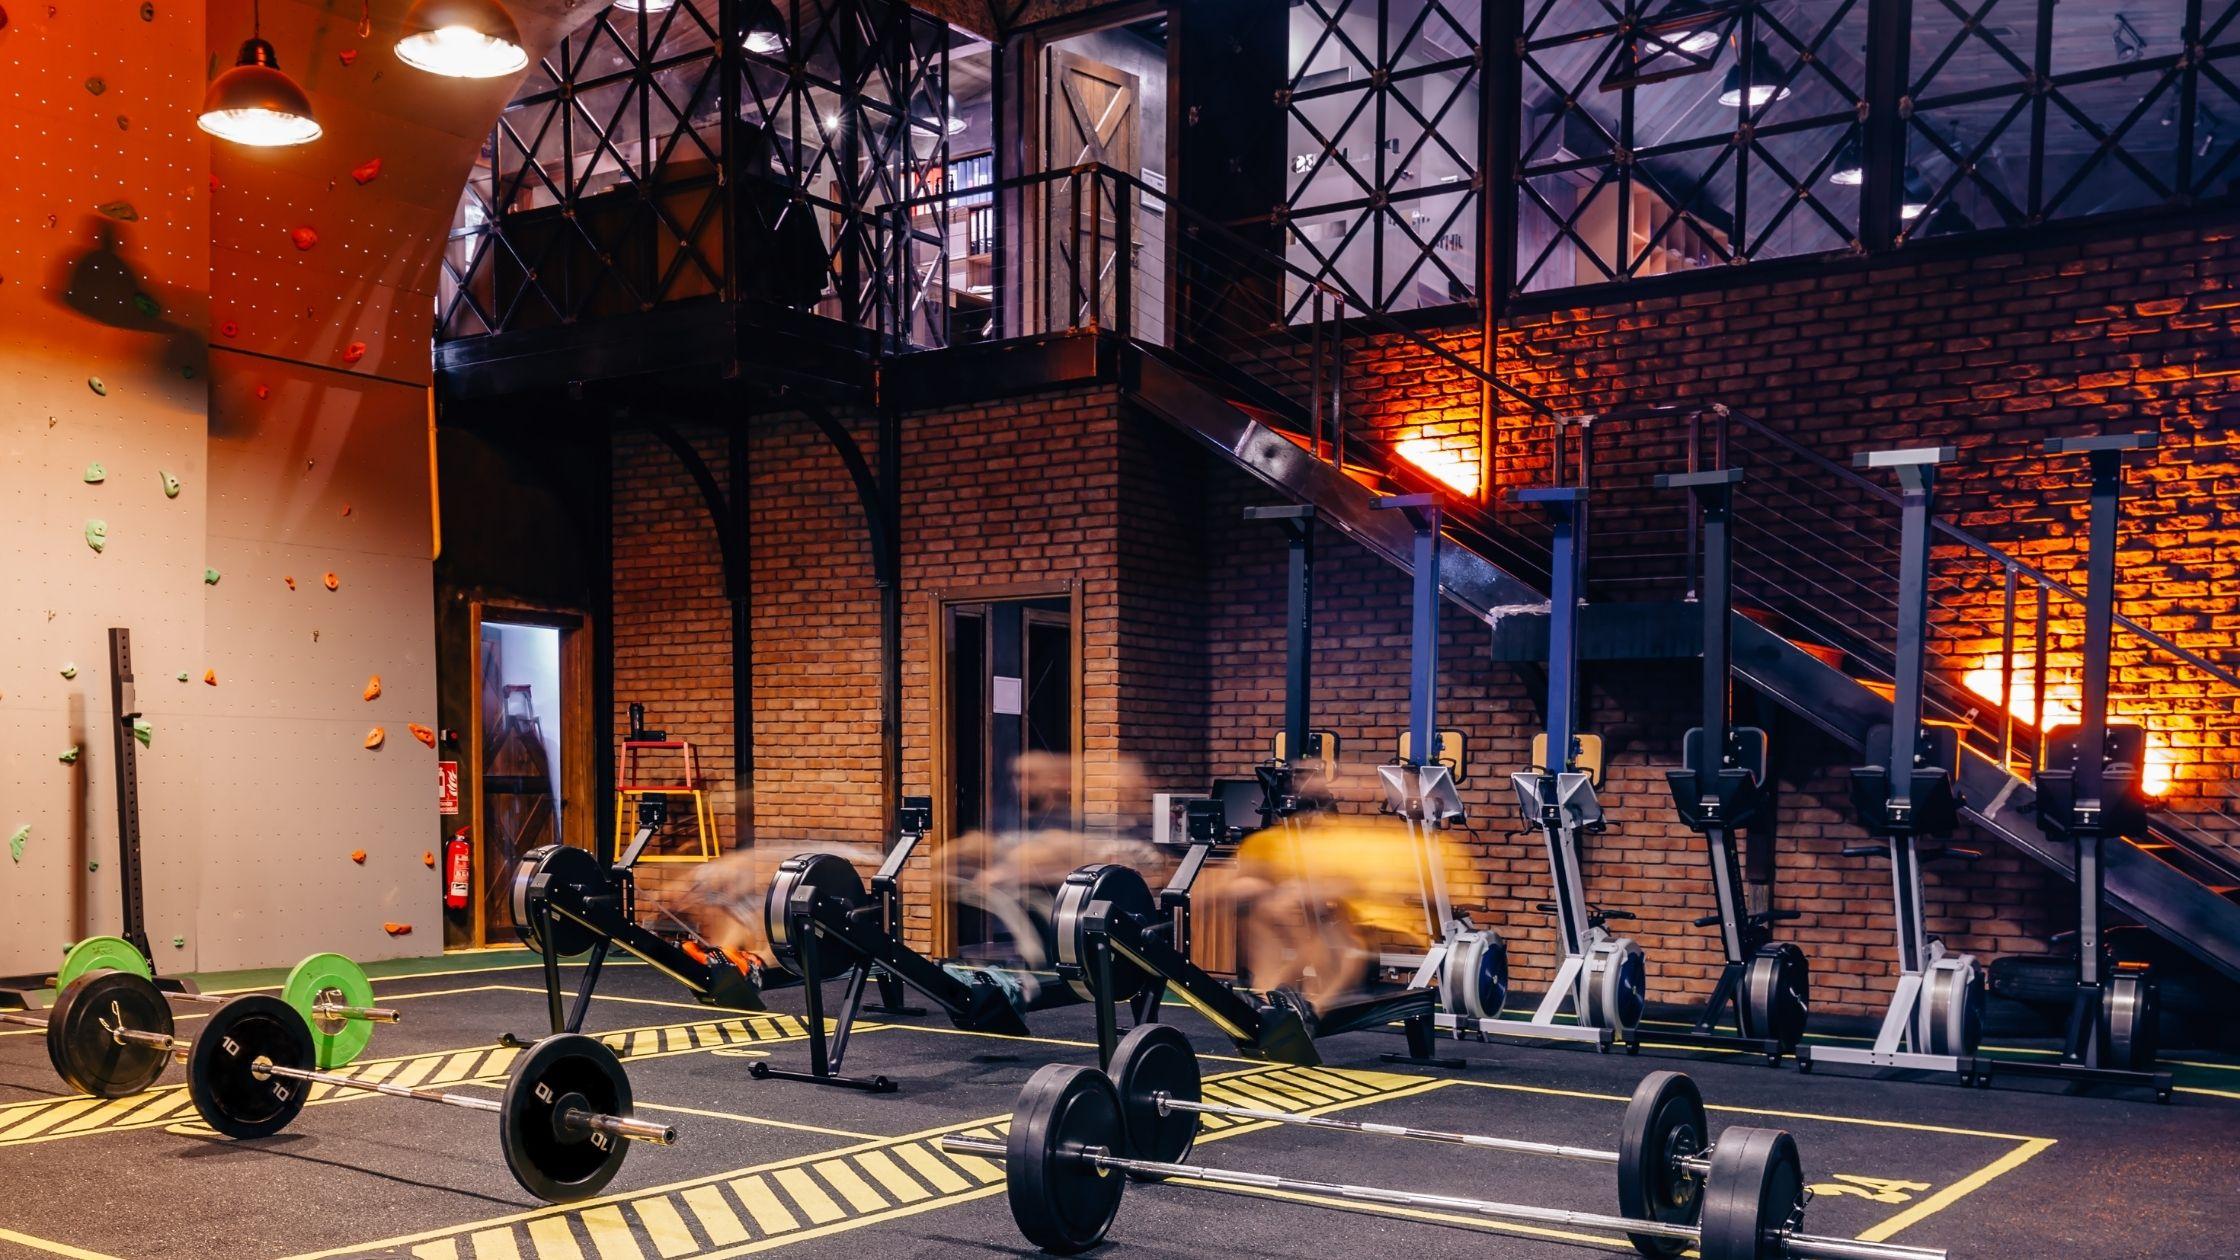 types of gyms: Big box gym